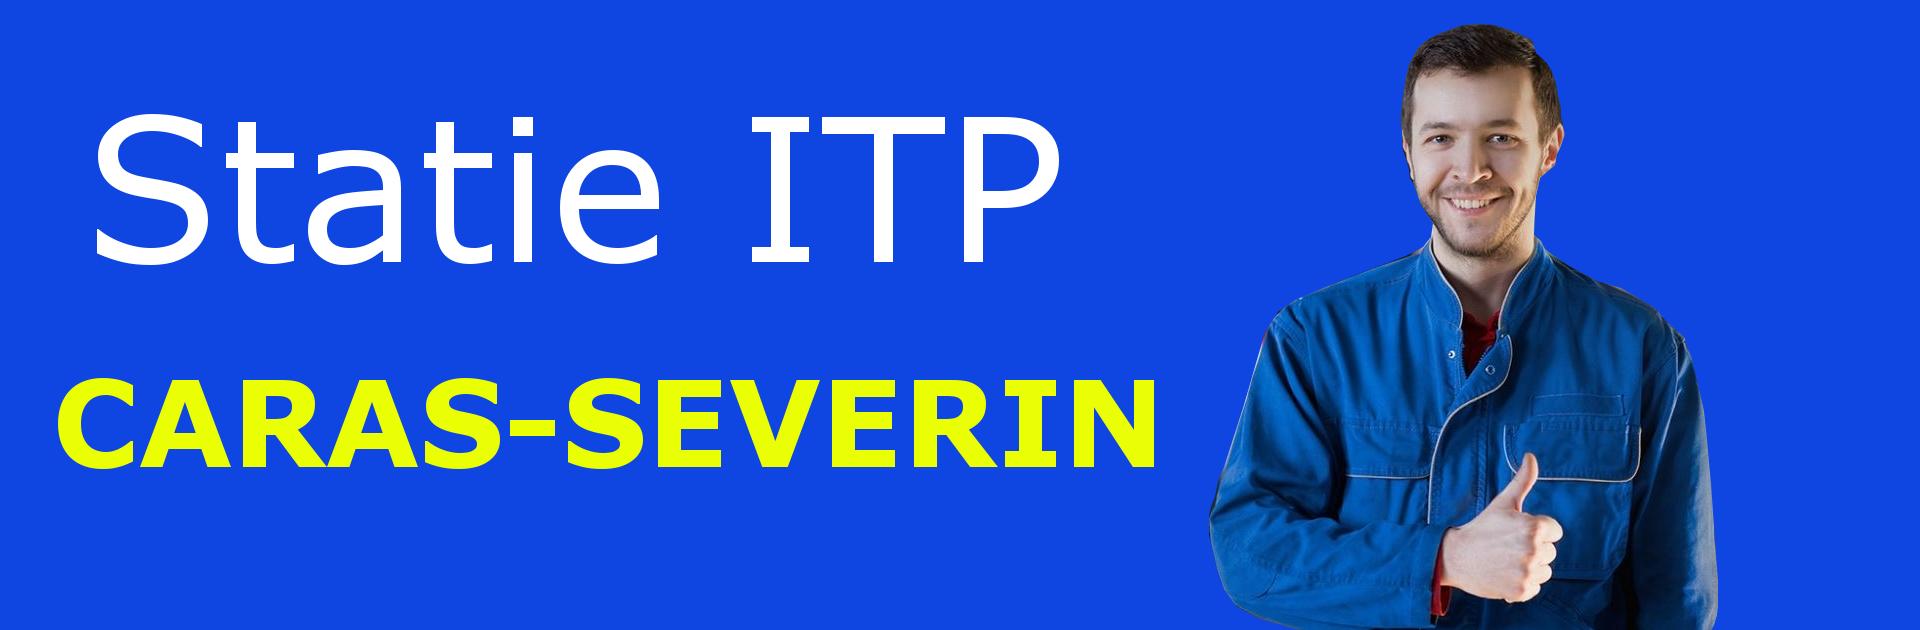 Banner ITP CARAS-SEVERIN